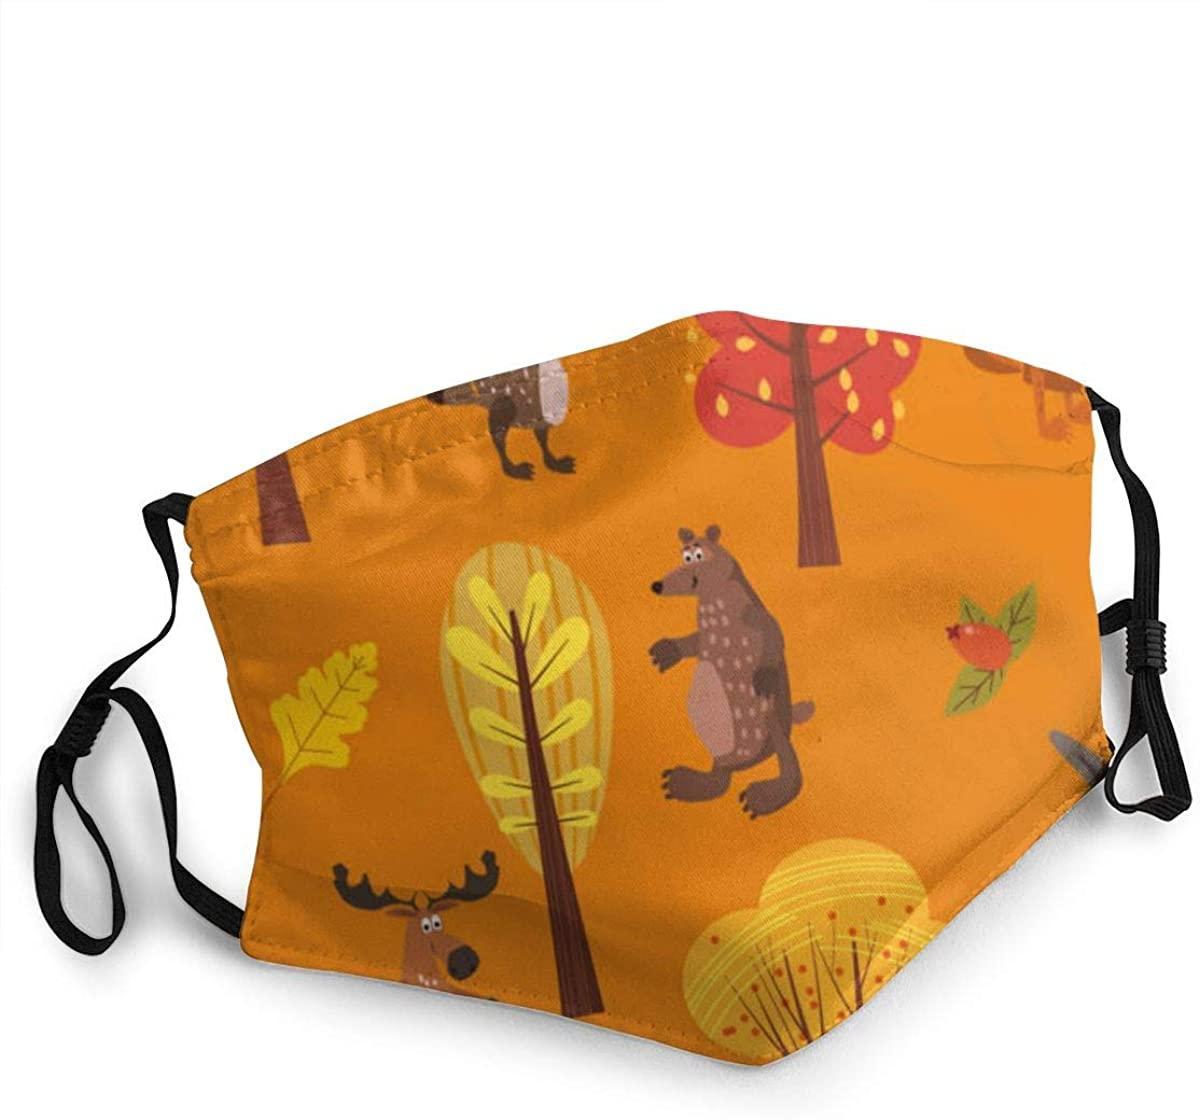 Fashion Protective Face Masks, Autumn Forest Cute Animals Unisex Dust Mouth Masks, Washable, Reusable Masks